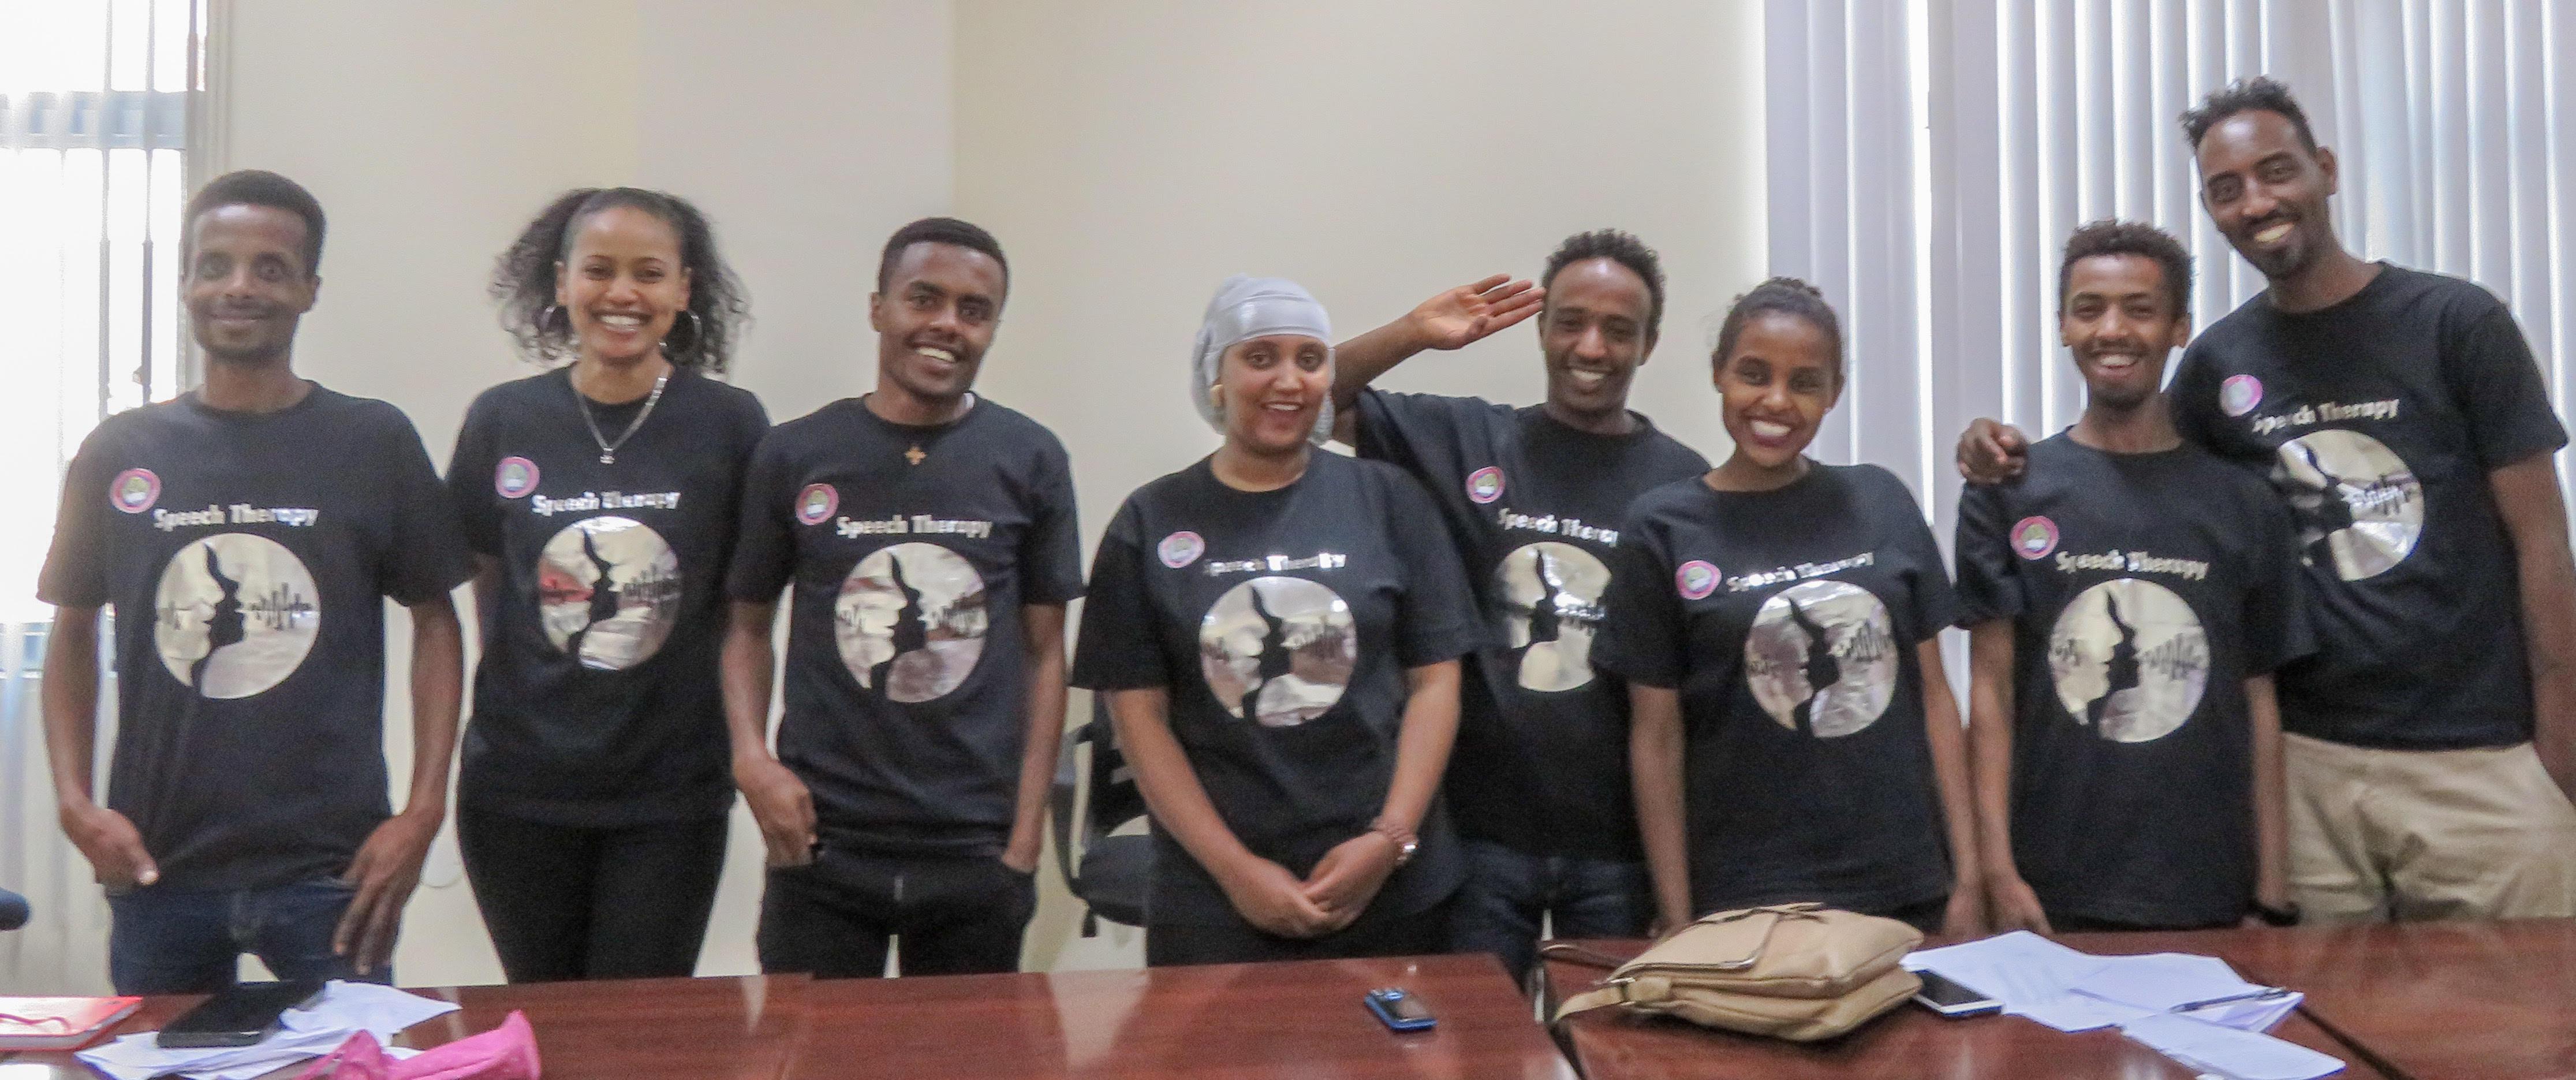 SLP Students Ethiopia Addis Ababa University - Transforming Faces